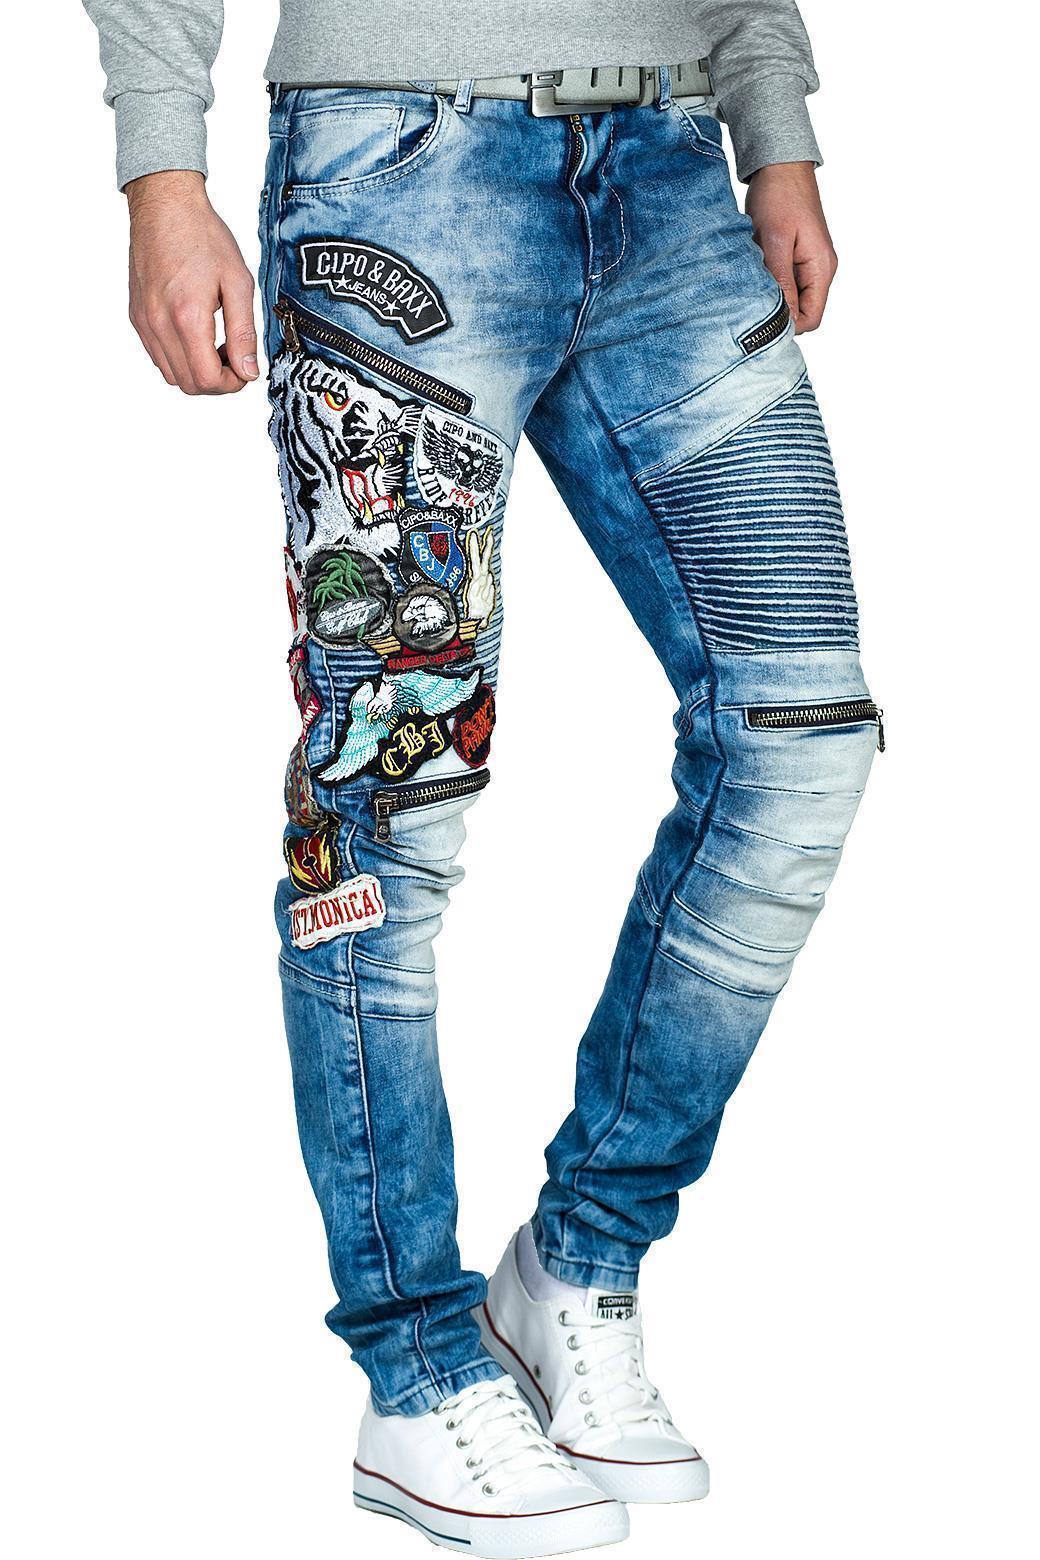 Cipo-amp-Baxx-Uomo-Jeans-Pantaloni-ricamate-Biker-Style-streetwear-nervature-pattern-Dope miniatura 37